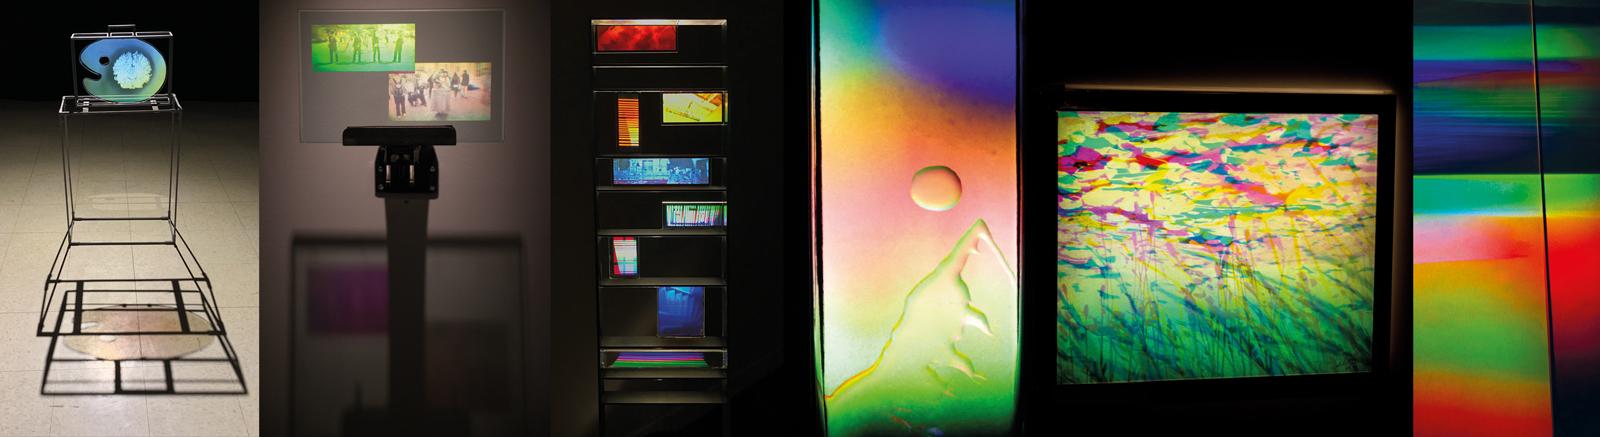 iridescence art holograms